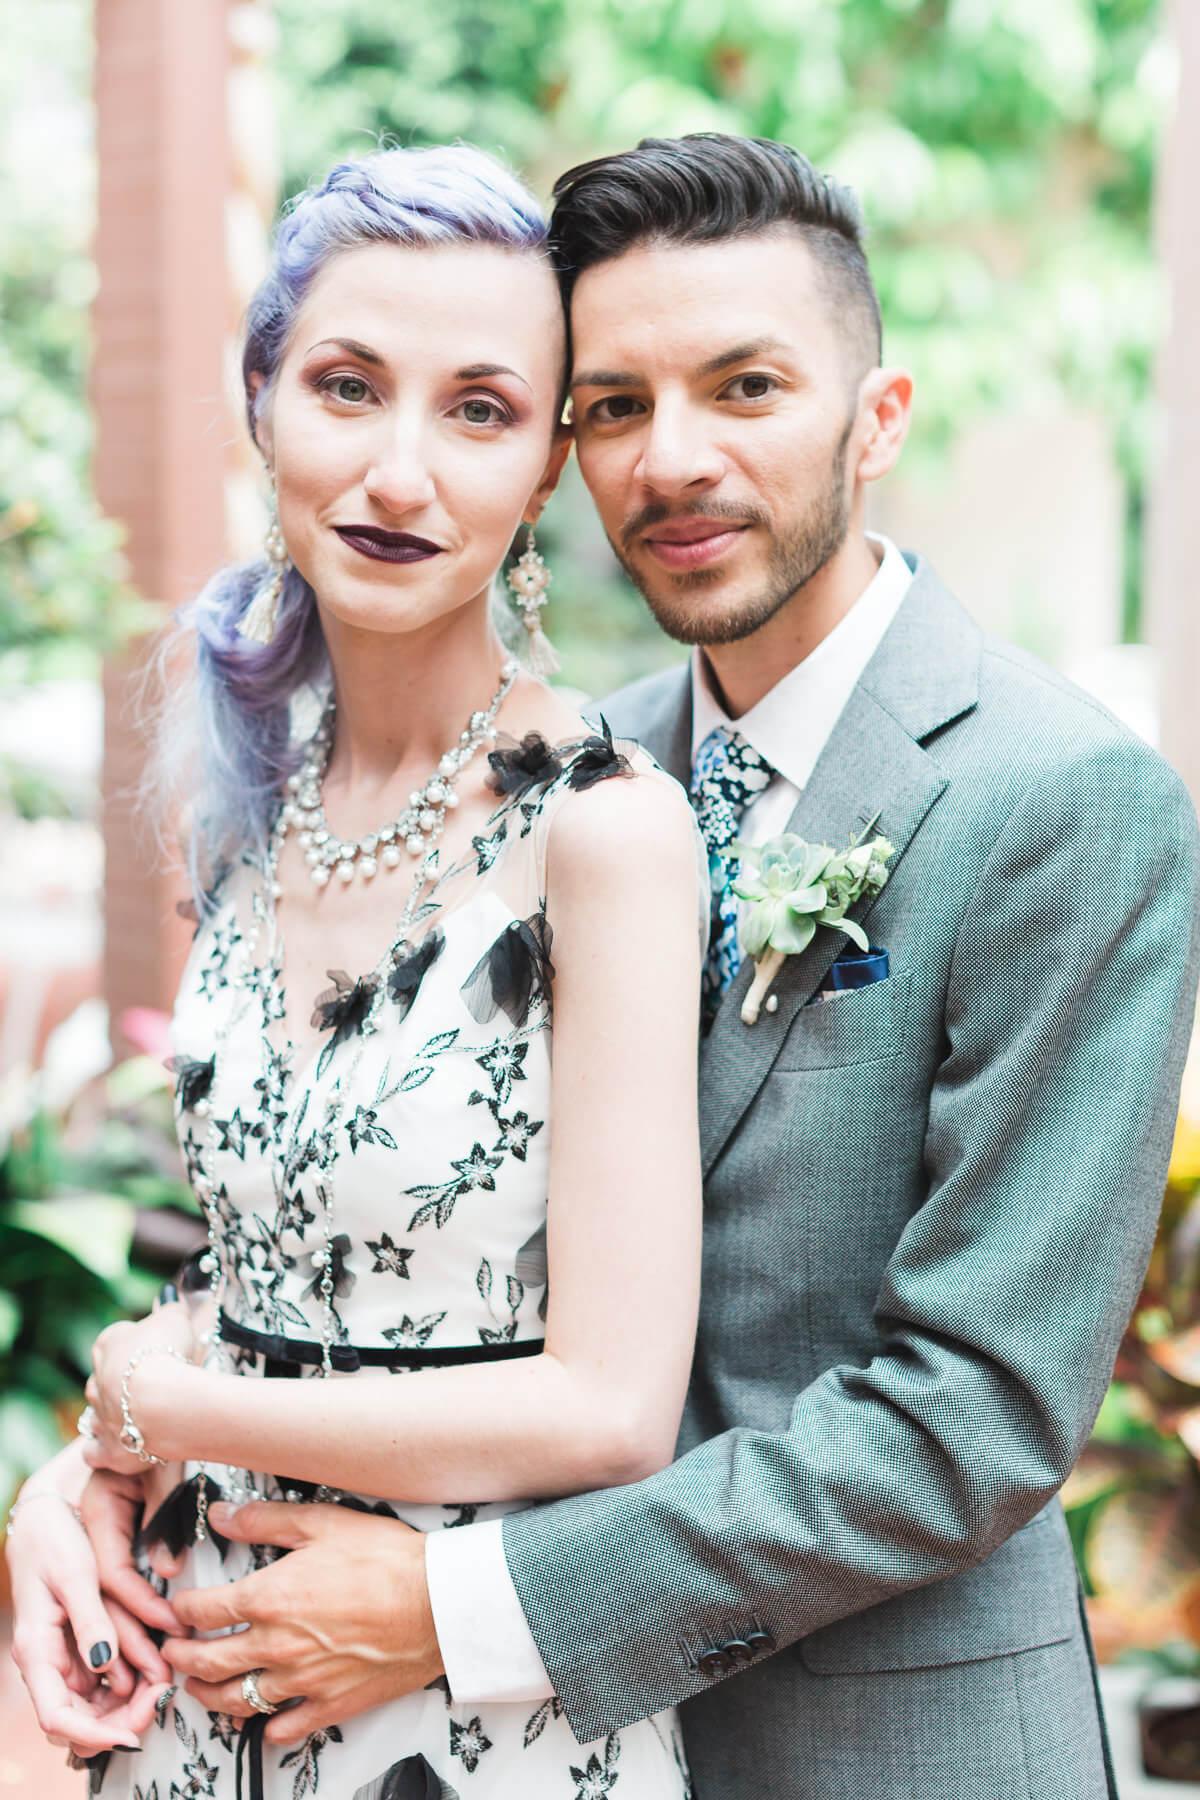 the_light_and_glass-wedding-photography-kim-jon-167.jpg